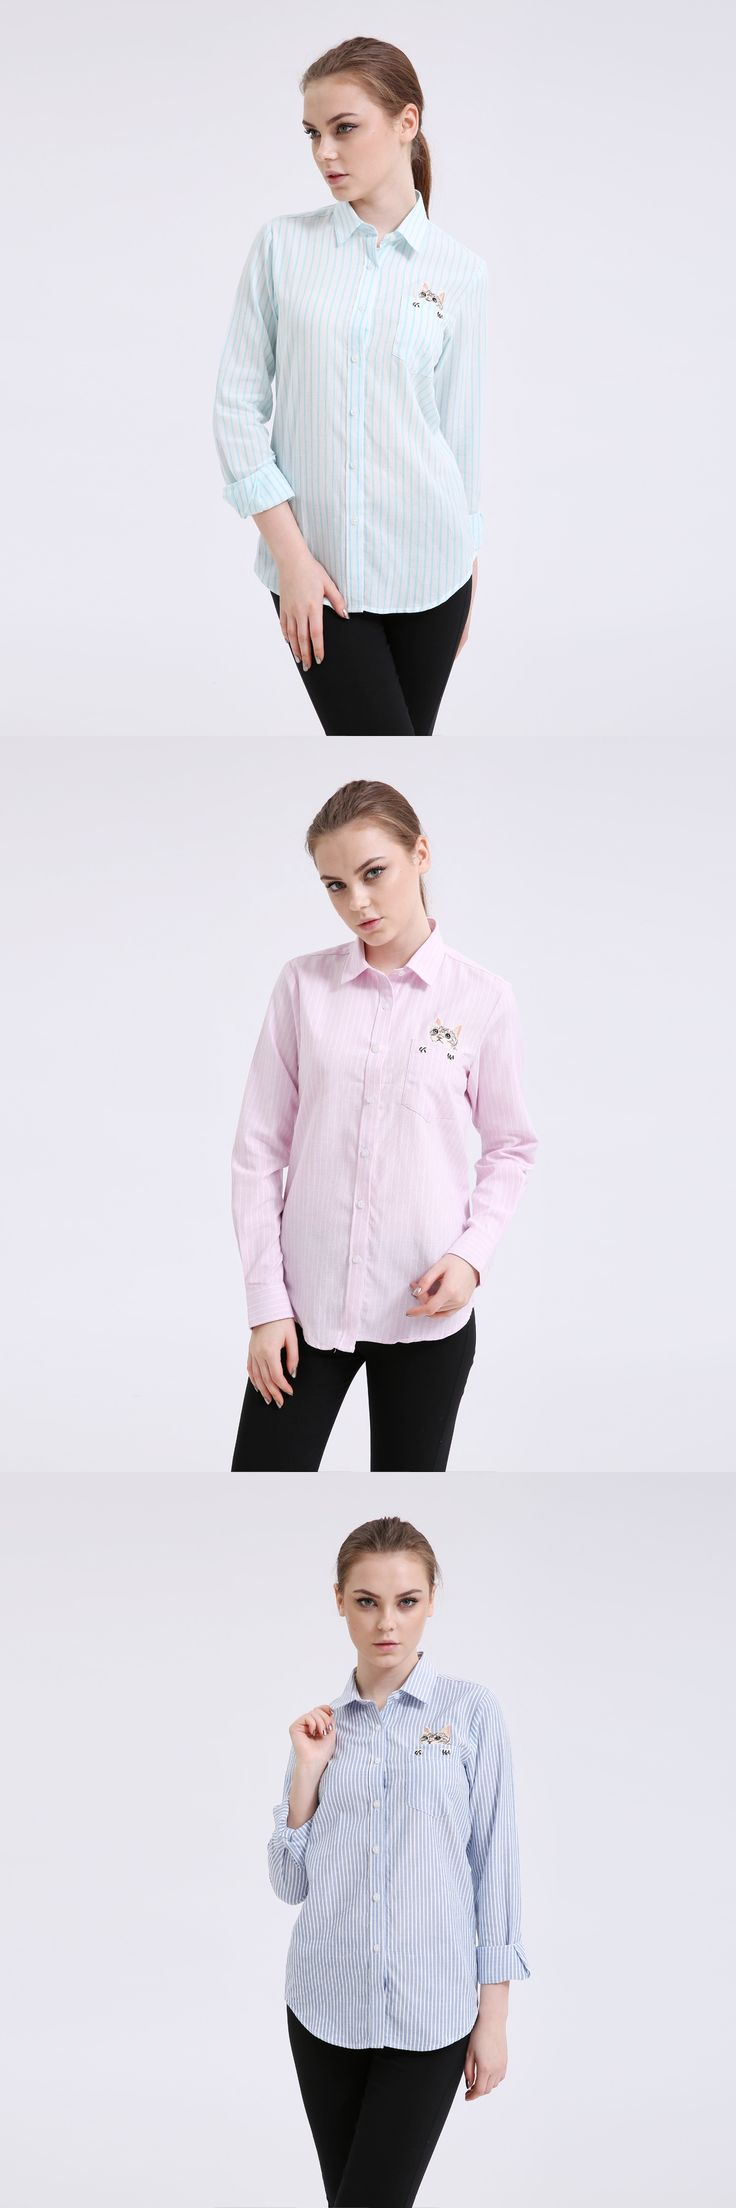 Dioufond New Women Animal Striped Blouses Plus Size 5XL Oxford Ladies Tops Long Sleeve Feminina Shirt High Quality 2017 Blusa